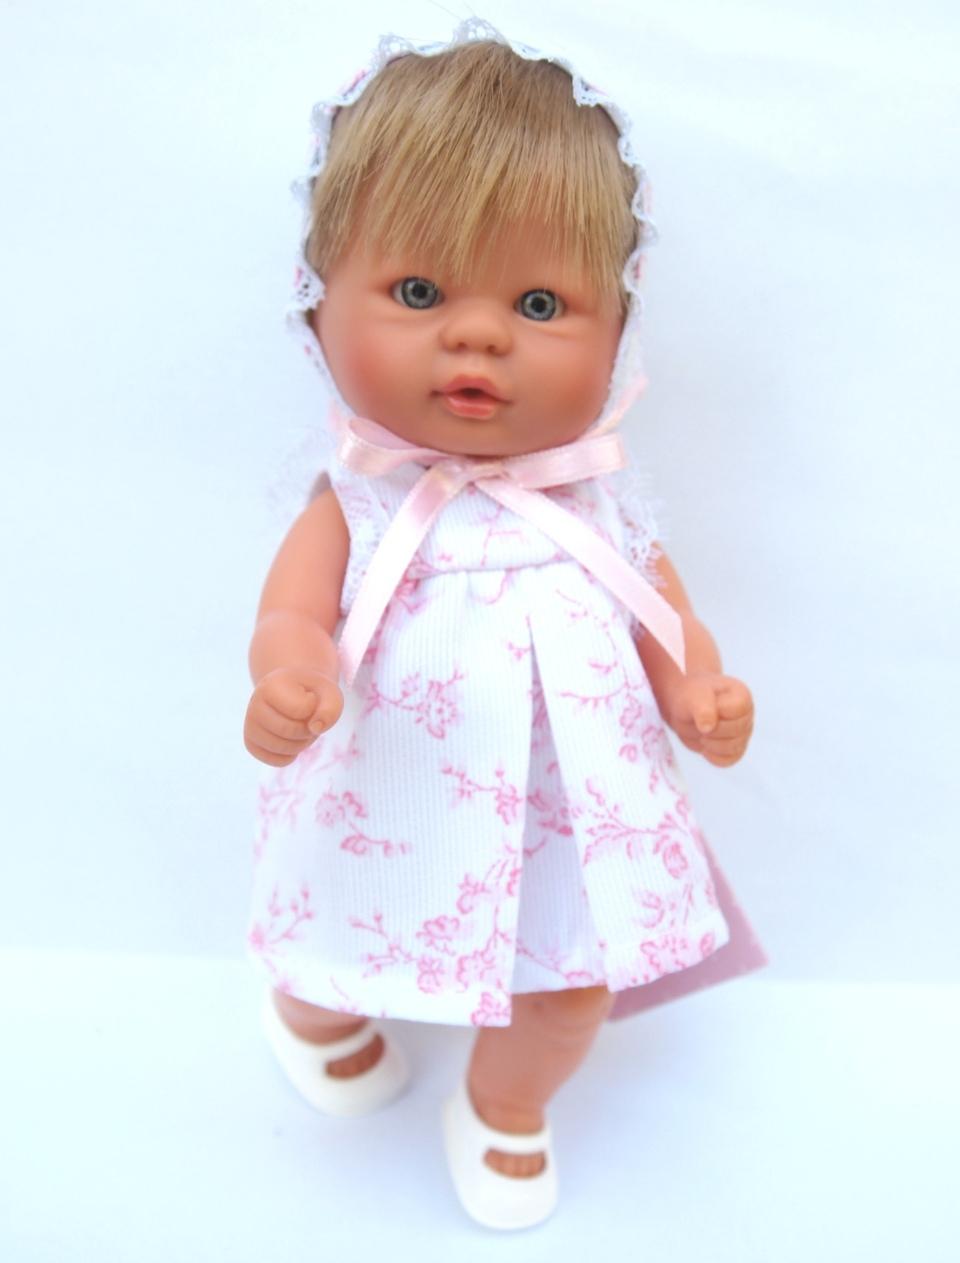 Кукла – Пупсик с челкой, 20 смКуклы ASI (Испания)<br>Кукла – Пупсик с челкой, 20 см<br>